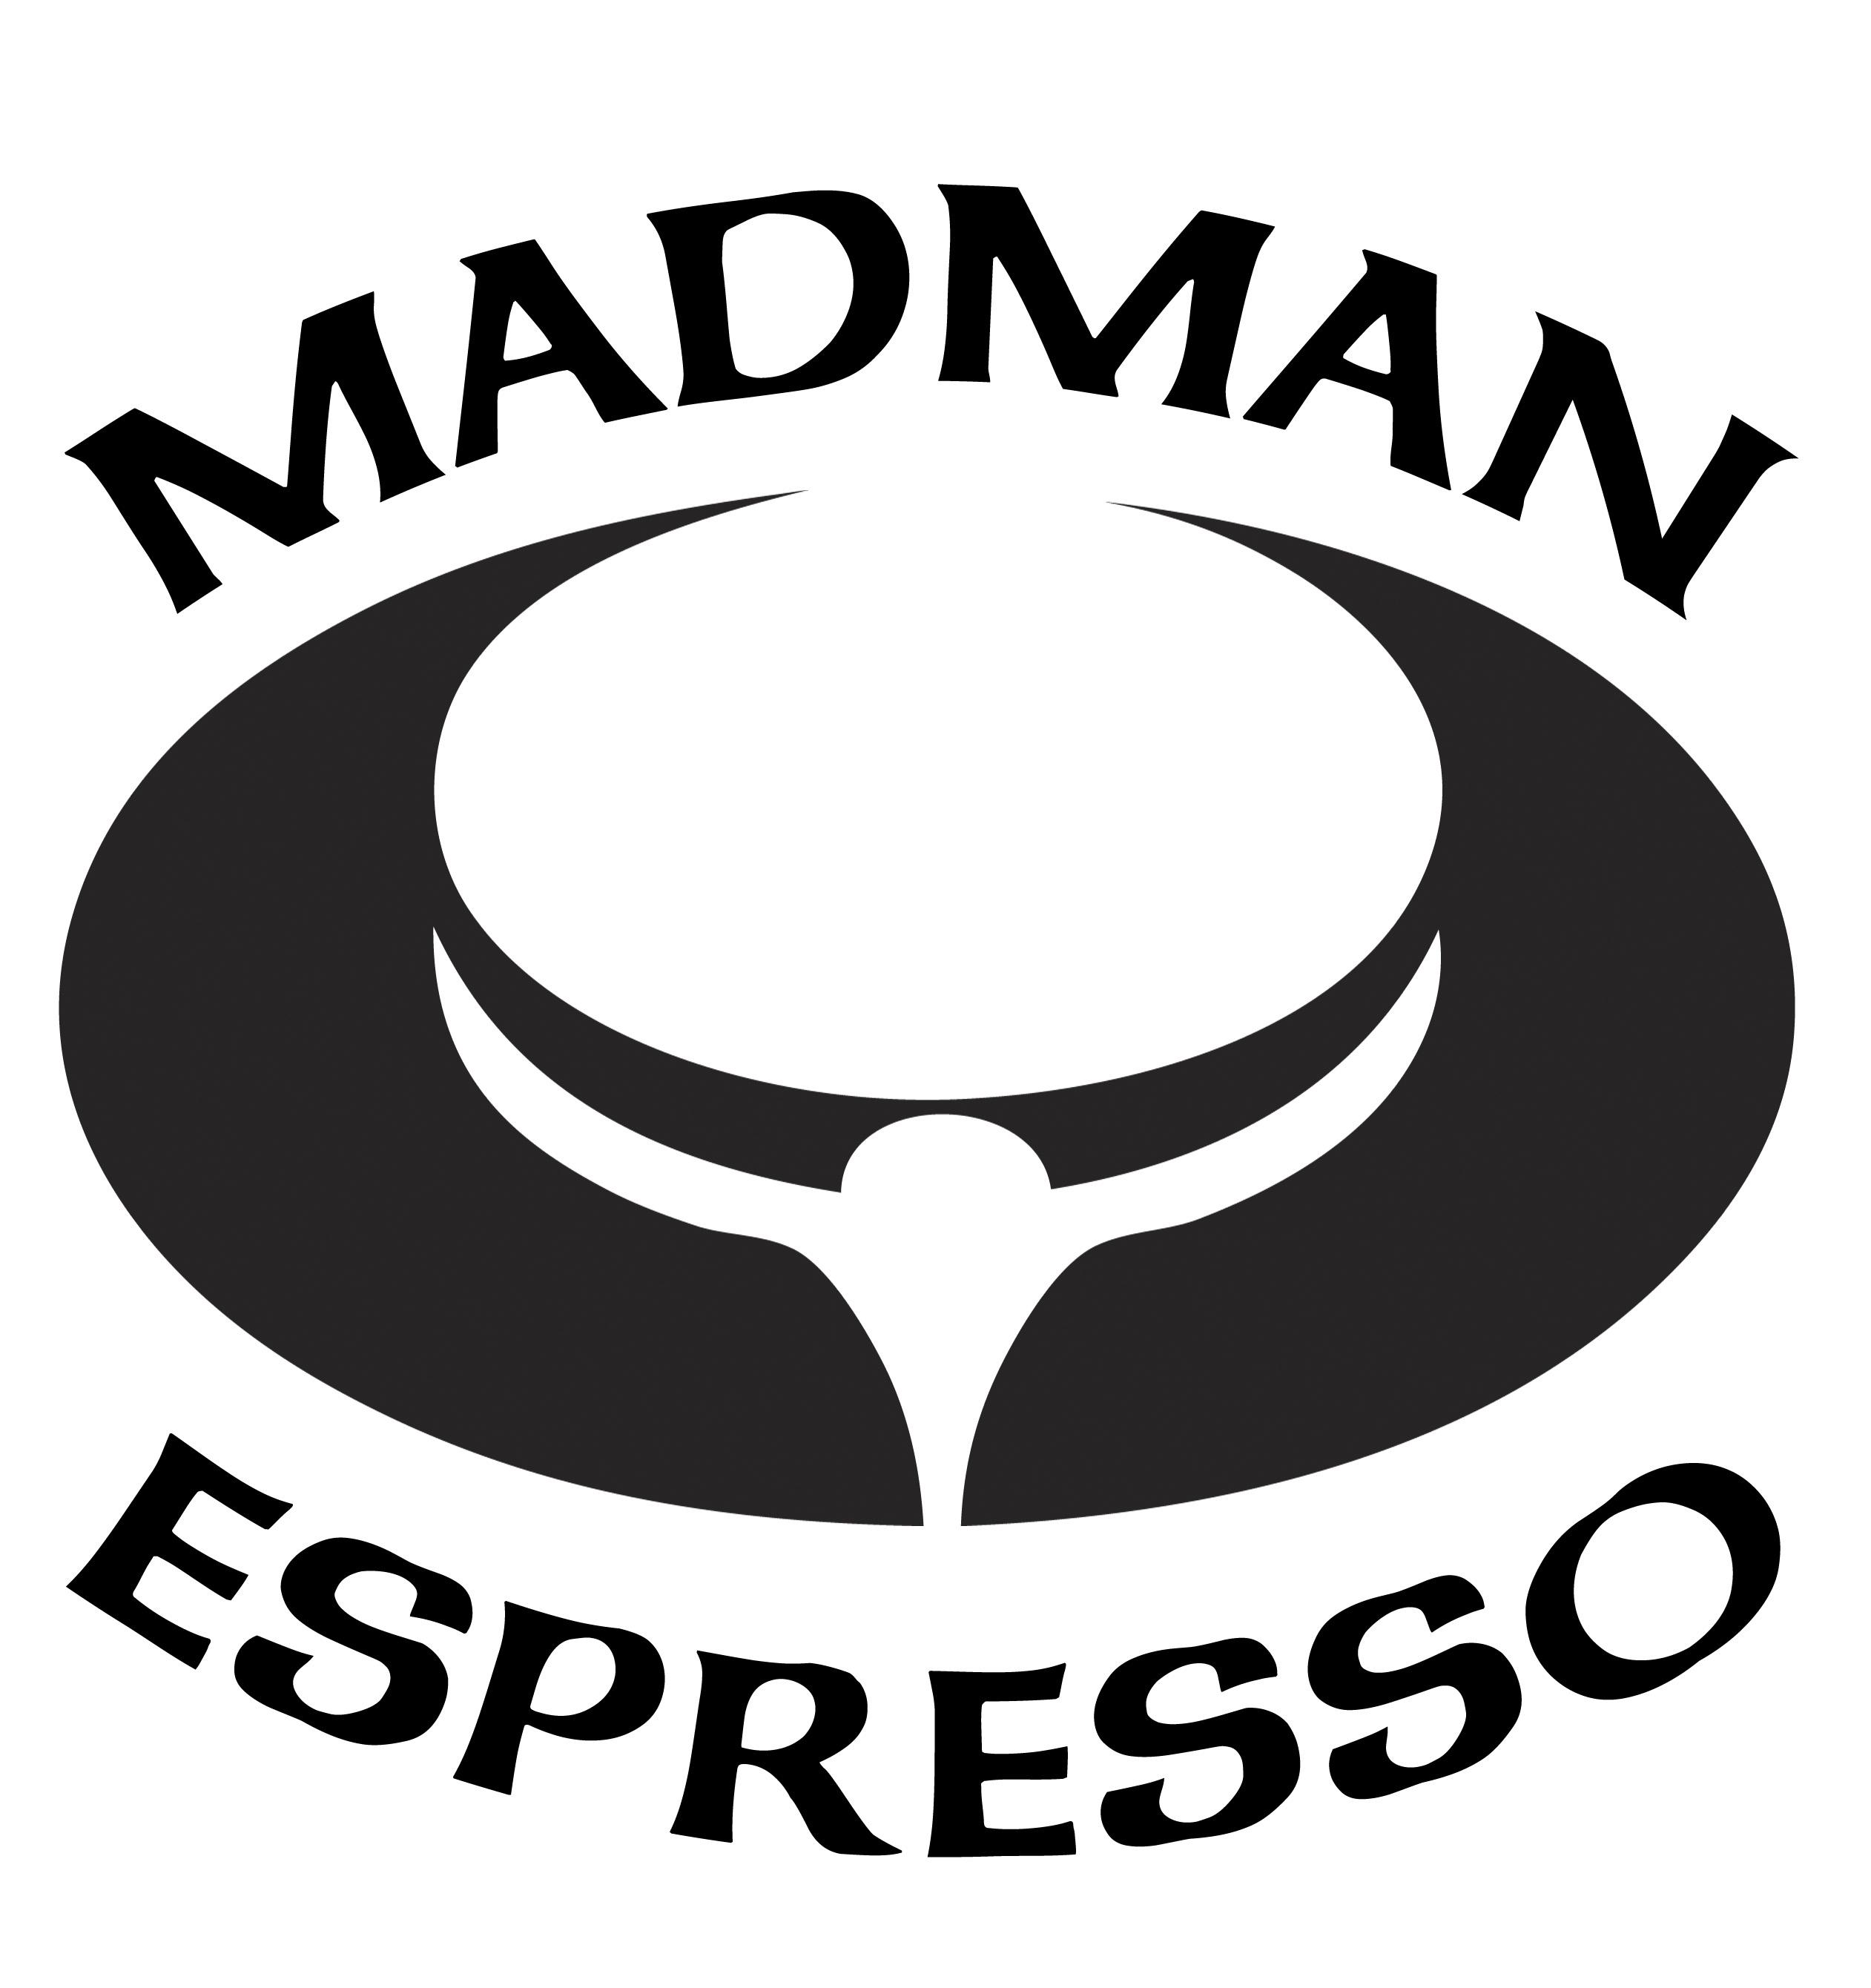 Madman Espresso